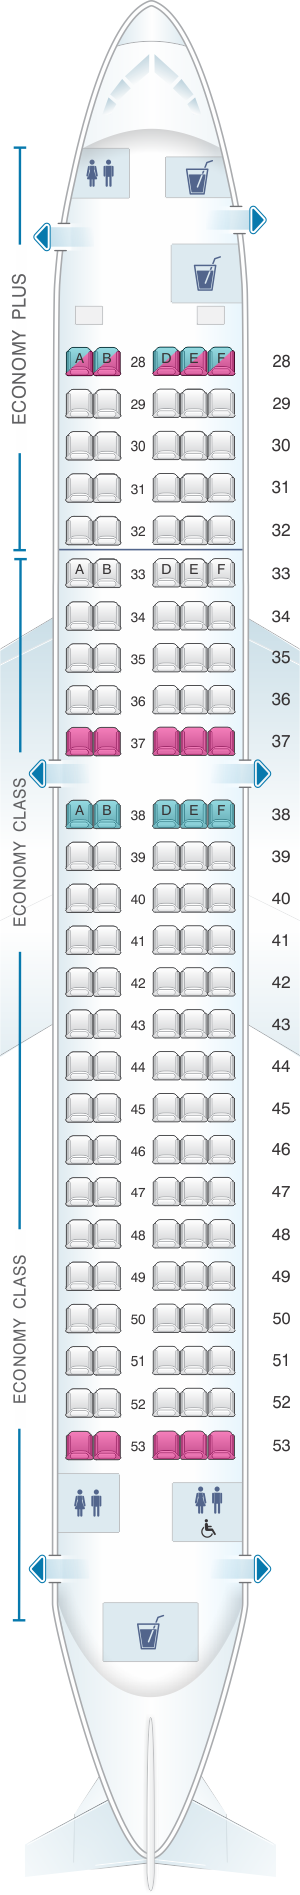 Seat map for Korean Air Airbus A220 300 v2